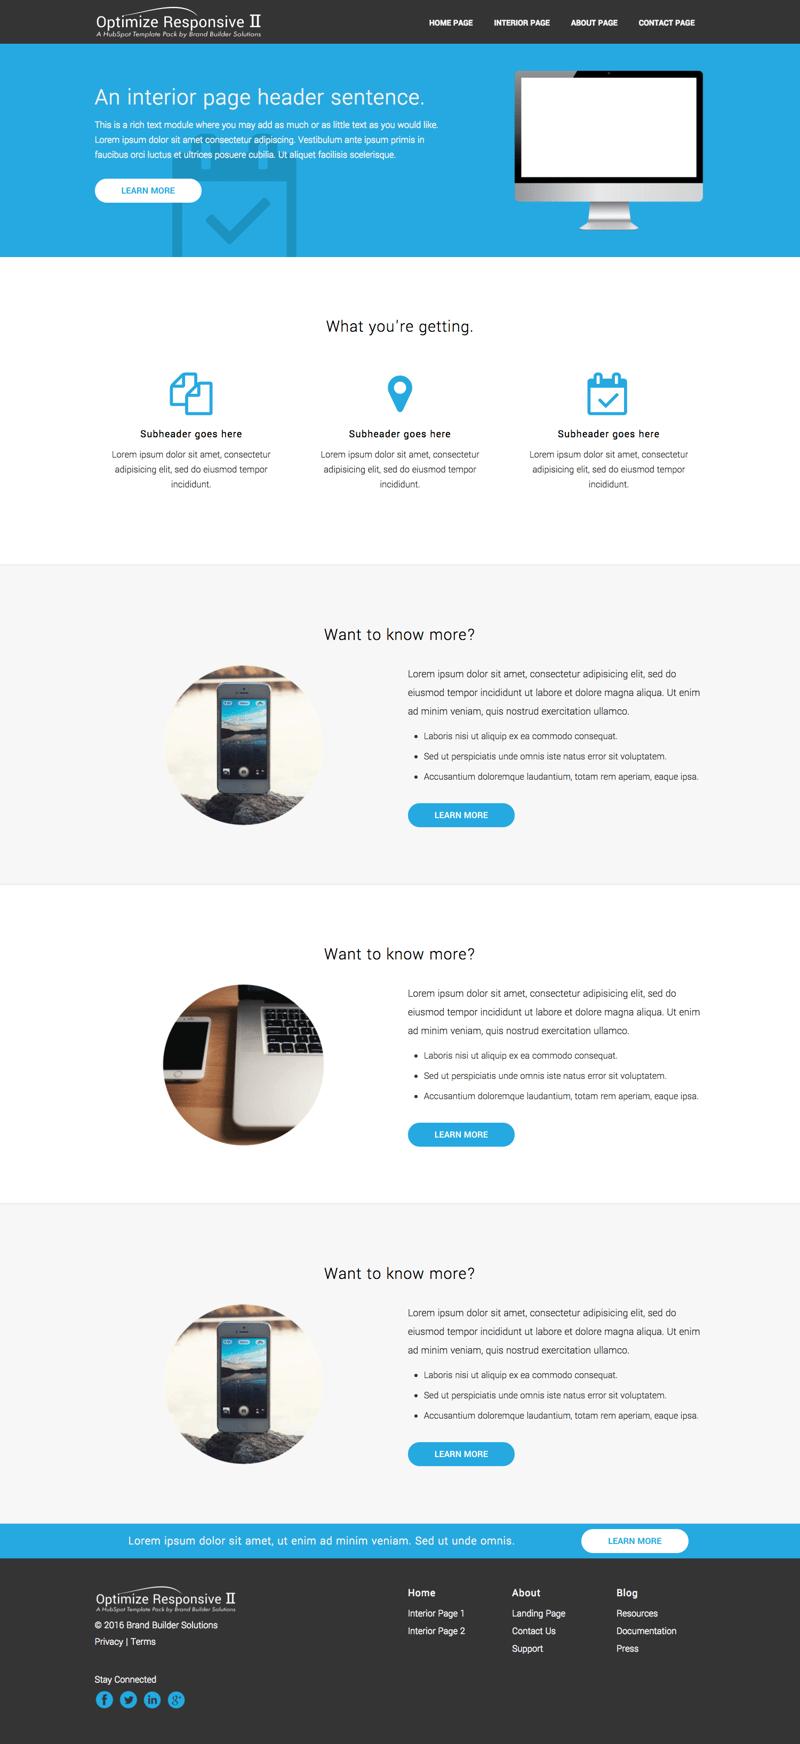 optimize responsive ii interior page 1. Black Bedroom Furniture Sets. Home Design Ideas